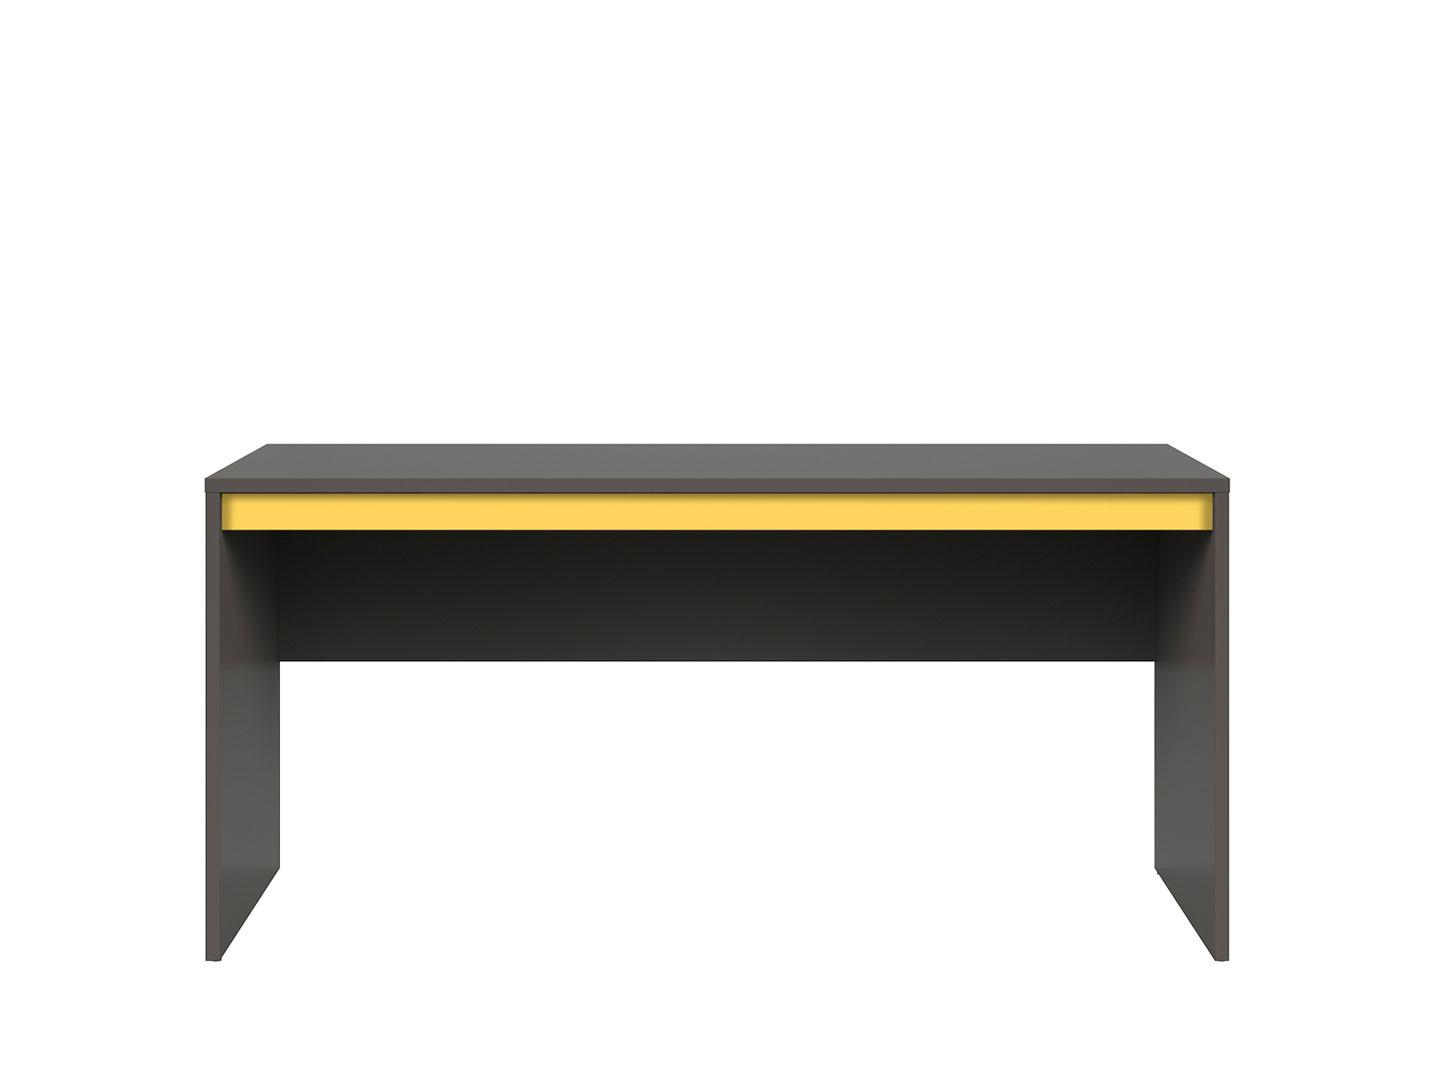 Kancelársky stôl GRAPHIC BIU/160 sivý wolfram